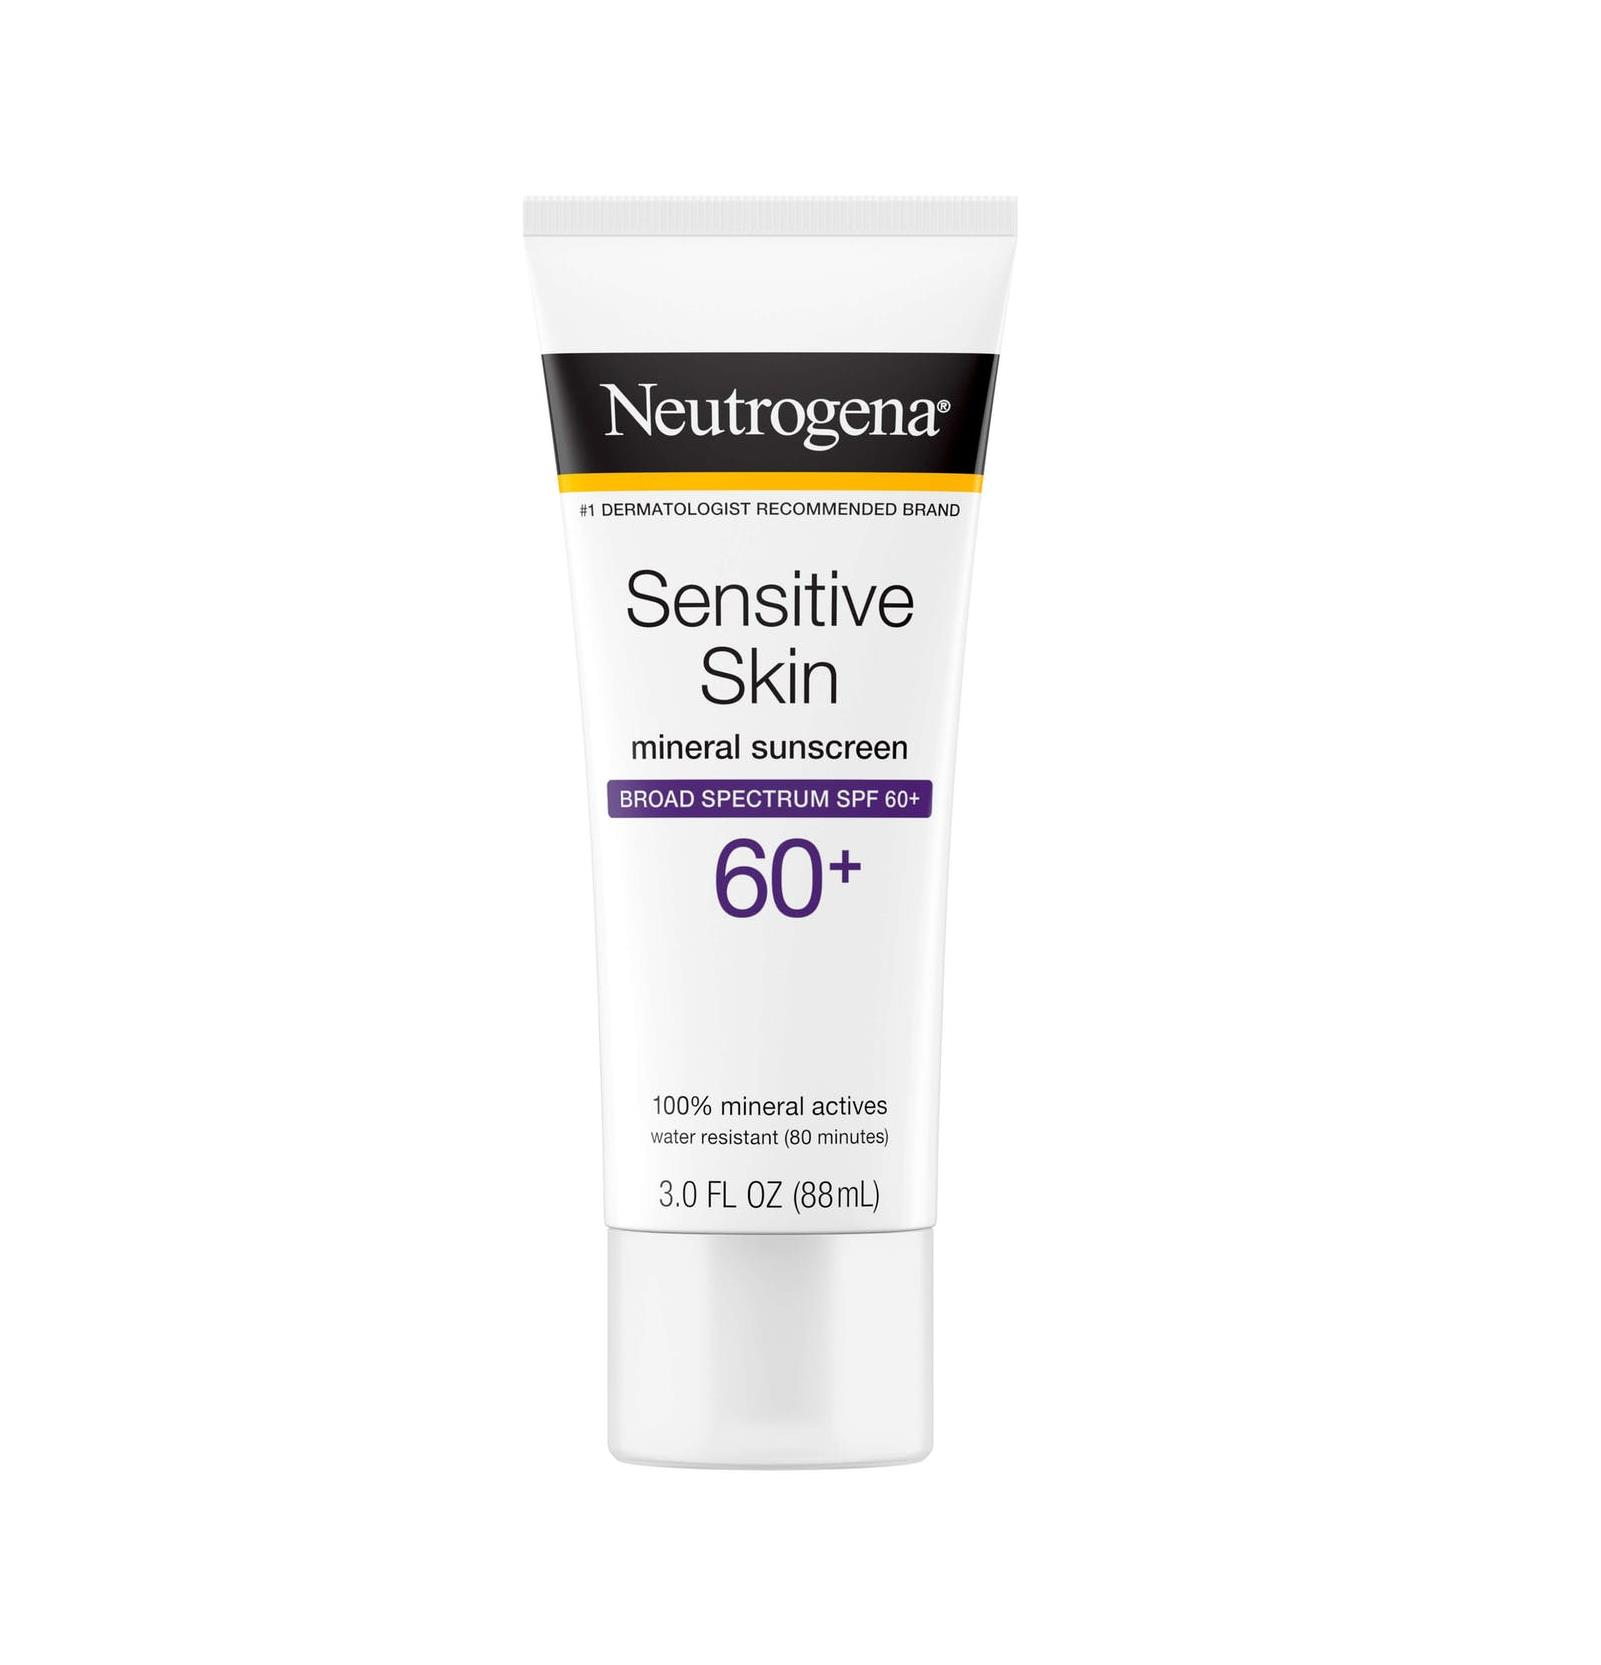 kem-chong-nang-neutrogena-sensitive-skin-sunscreen-spf60-review-thanh-phan-gia-cong-dung